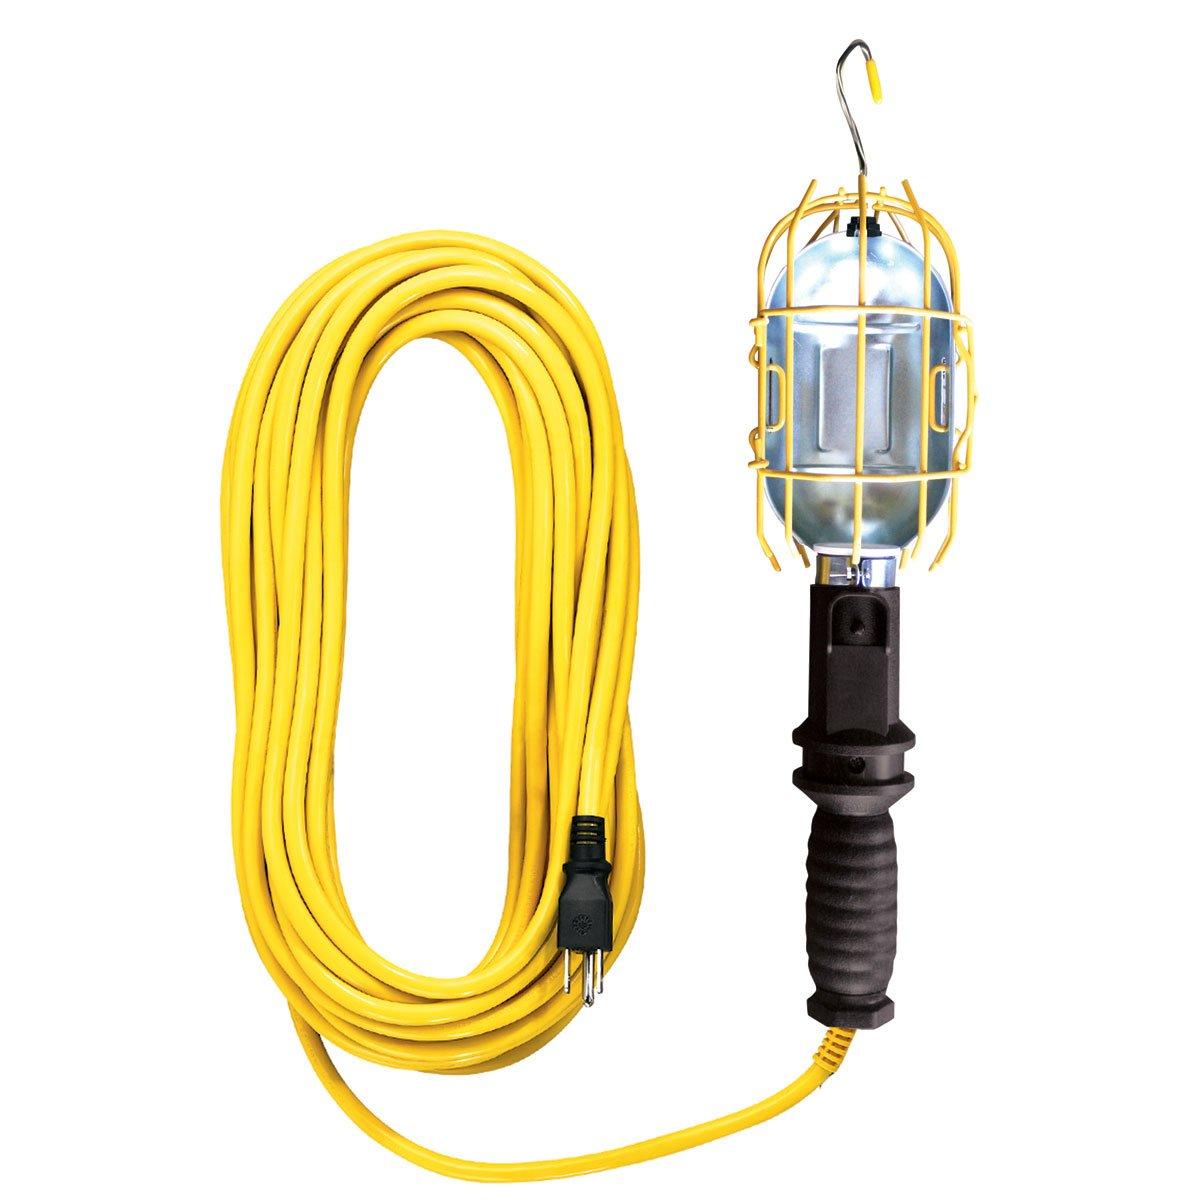 Voltec 500 Watt Heavy Duty Halogen Work Light 08 00609: Voltec Power & Lighting